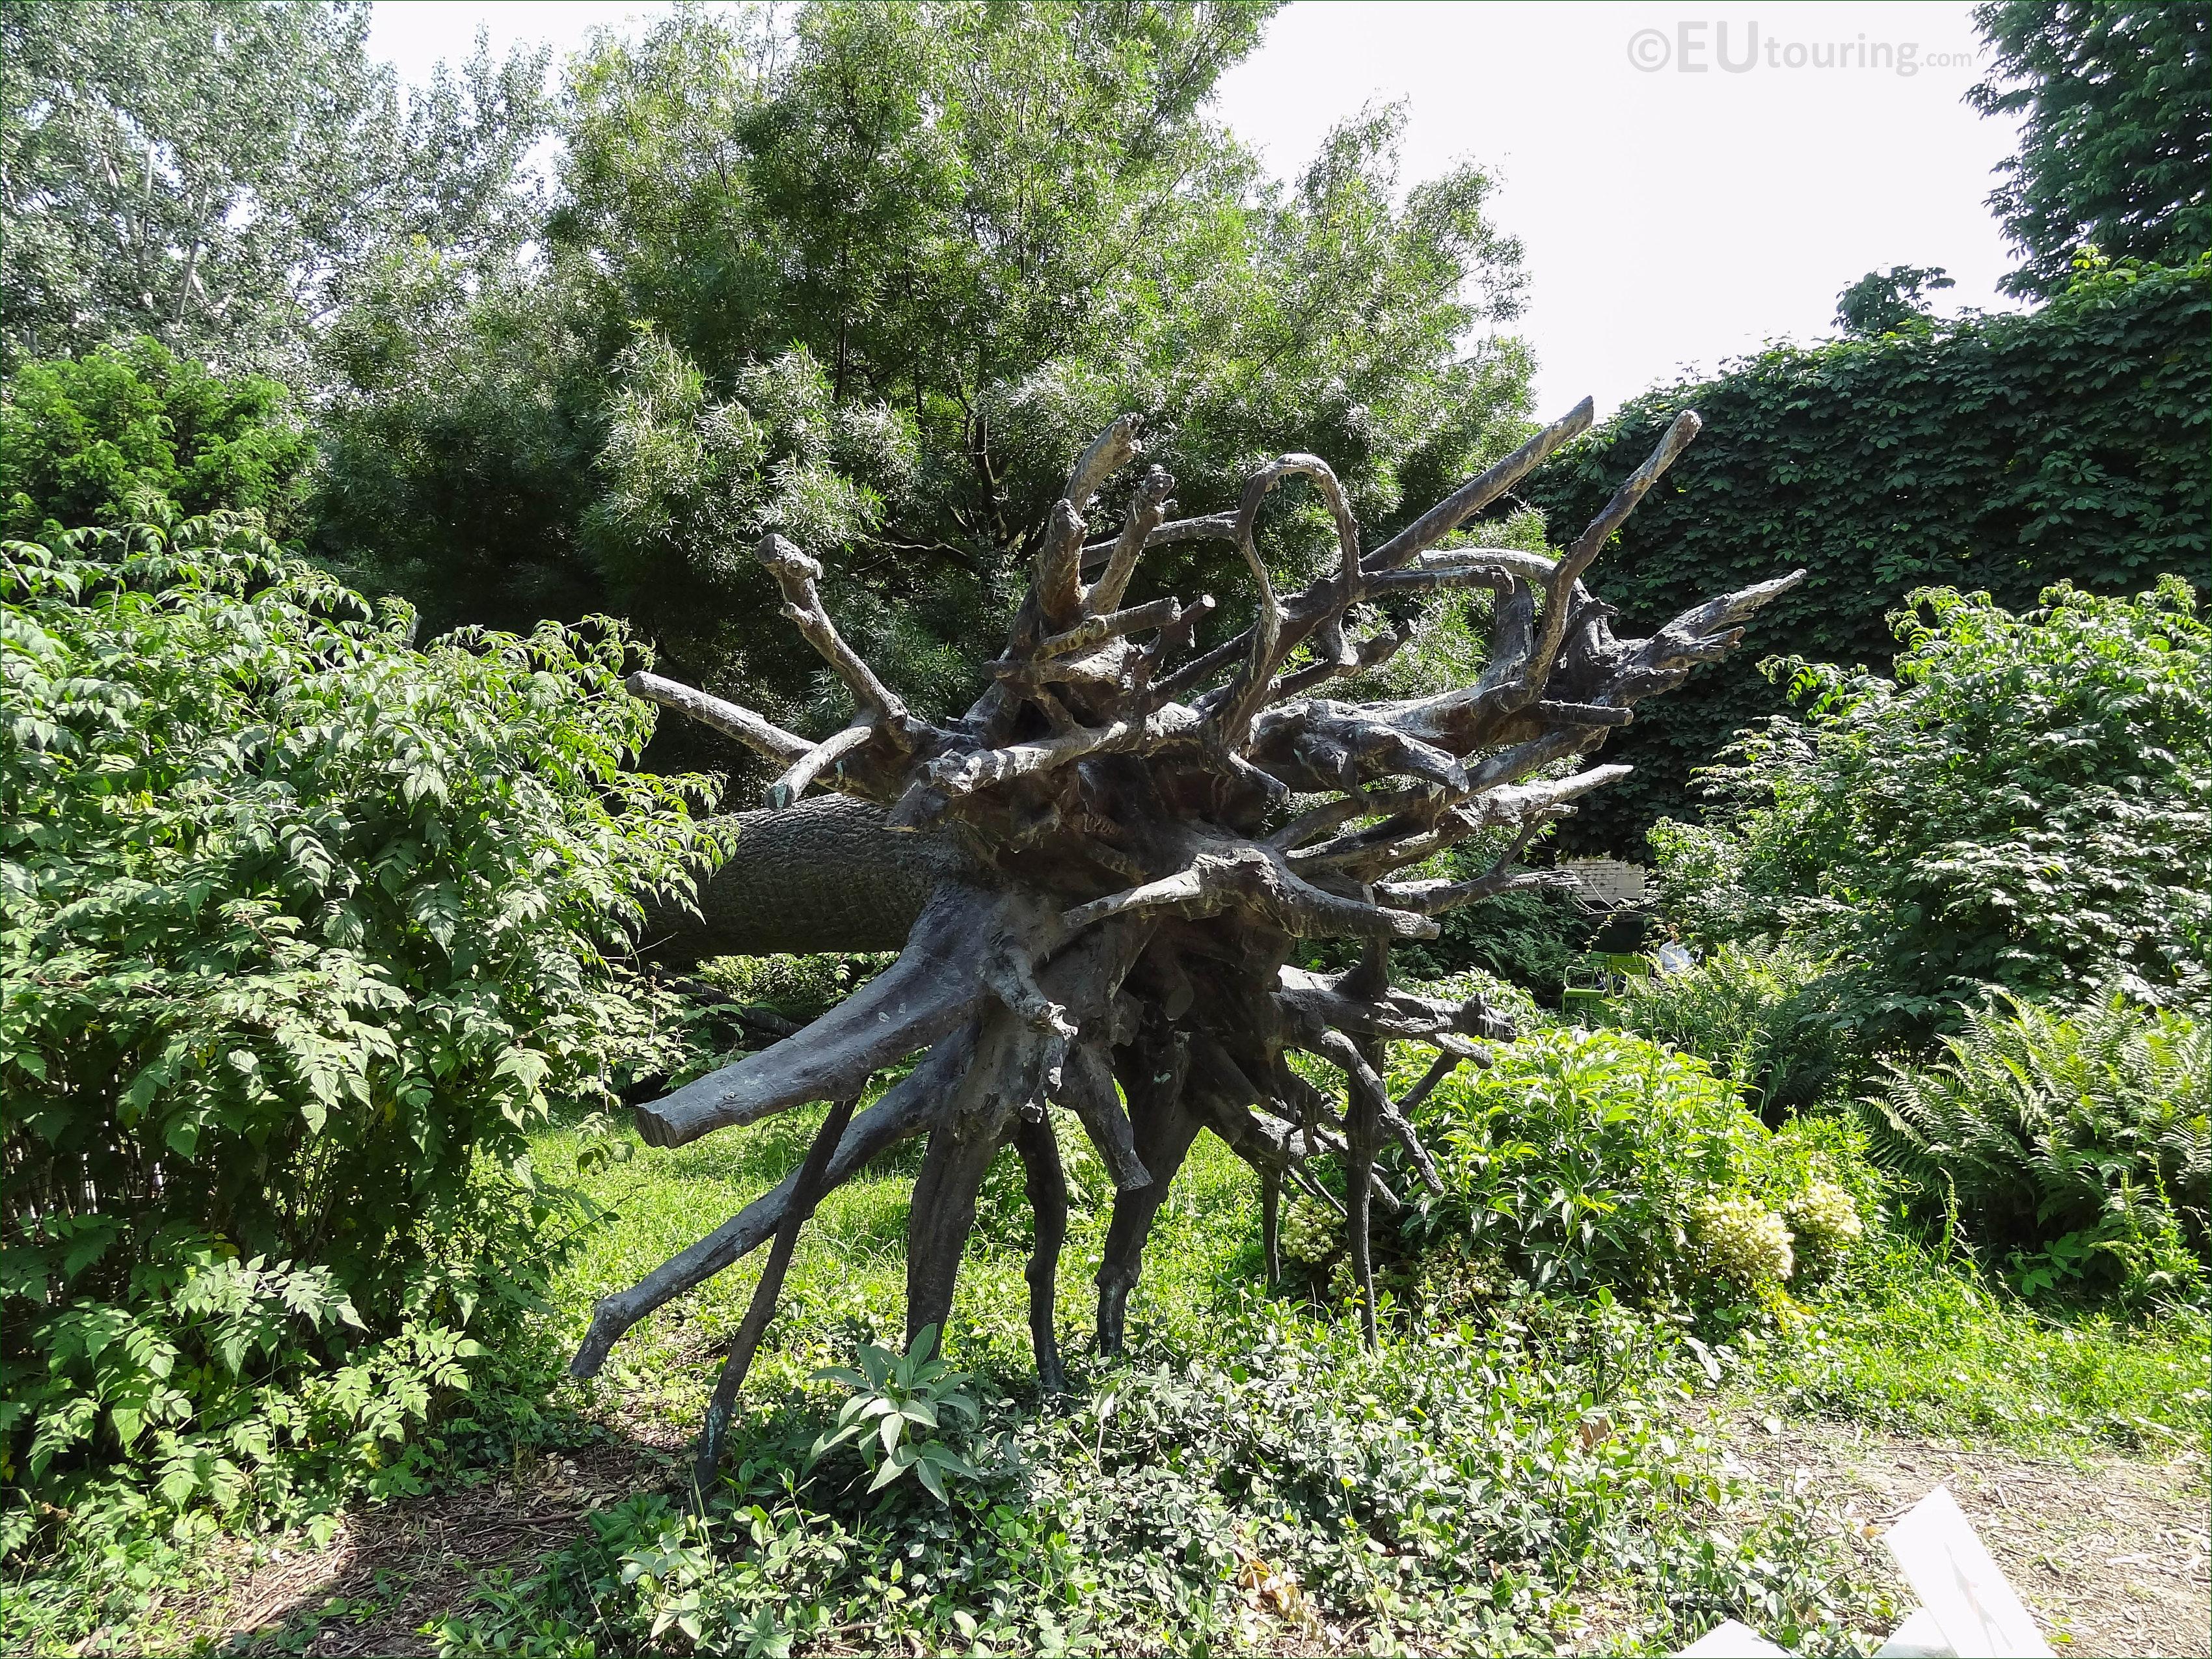 l 39 arbre des vyelles bronze sculpture in jardin des tuileries page 809. Black Bedroom Furniture Sets. Home Design Ideas